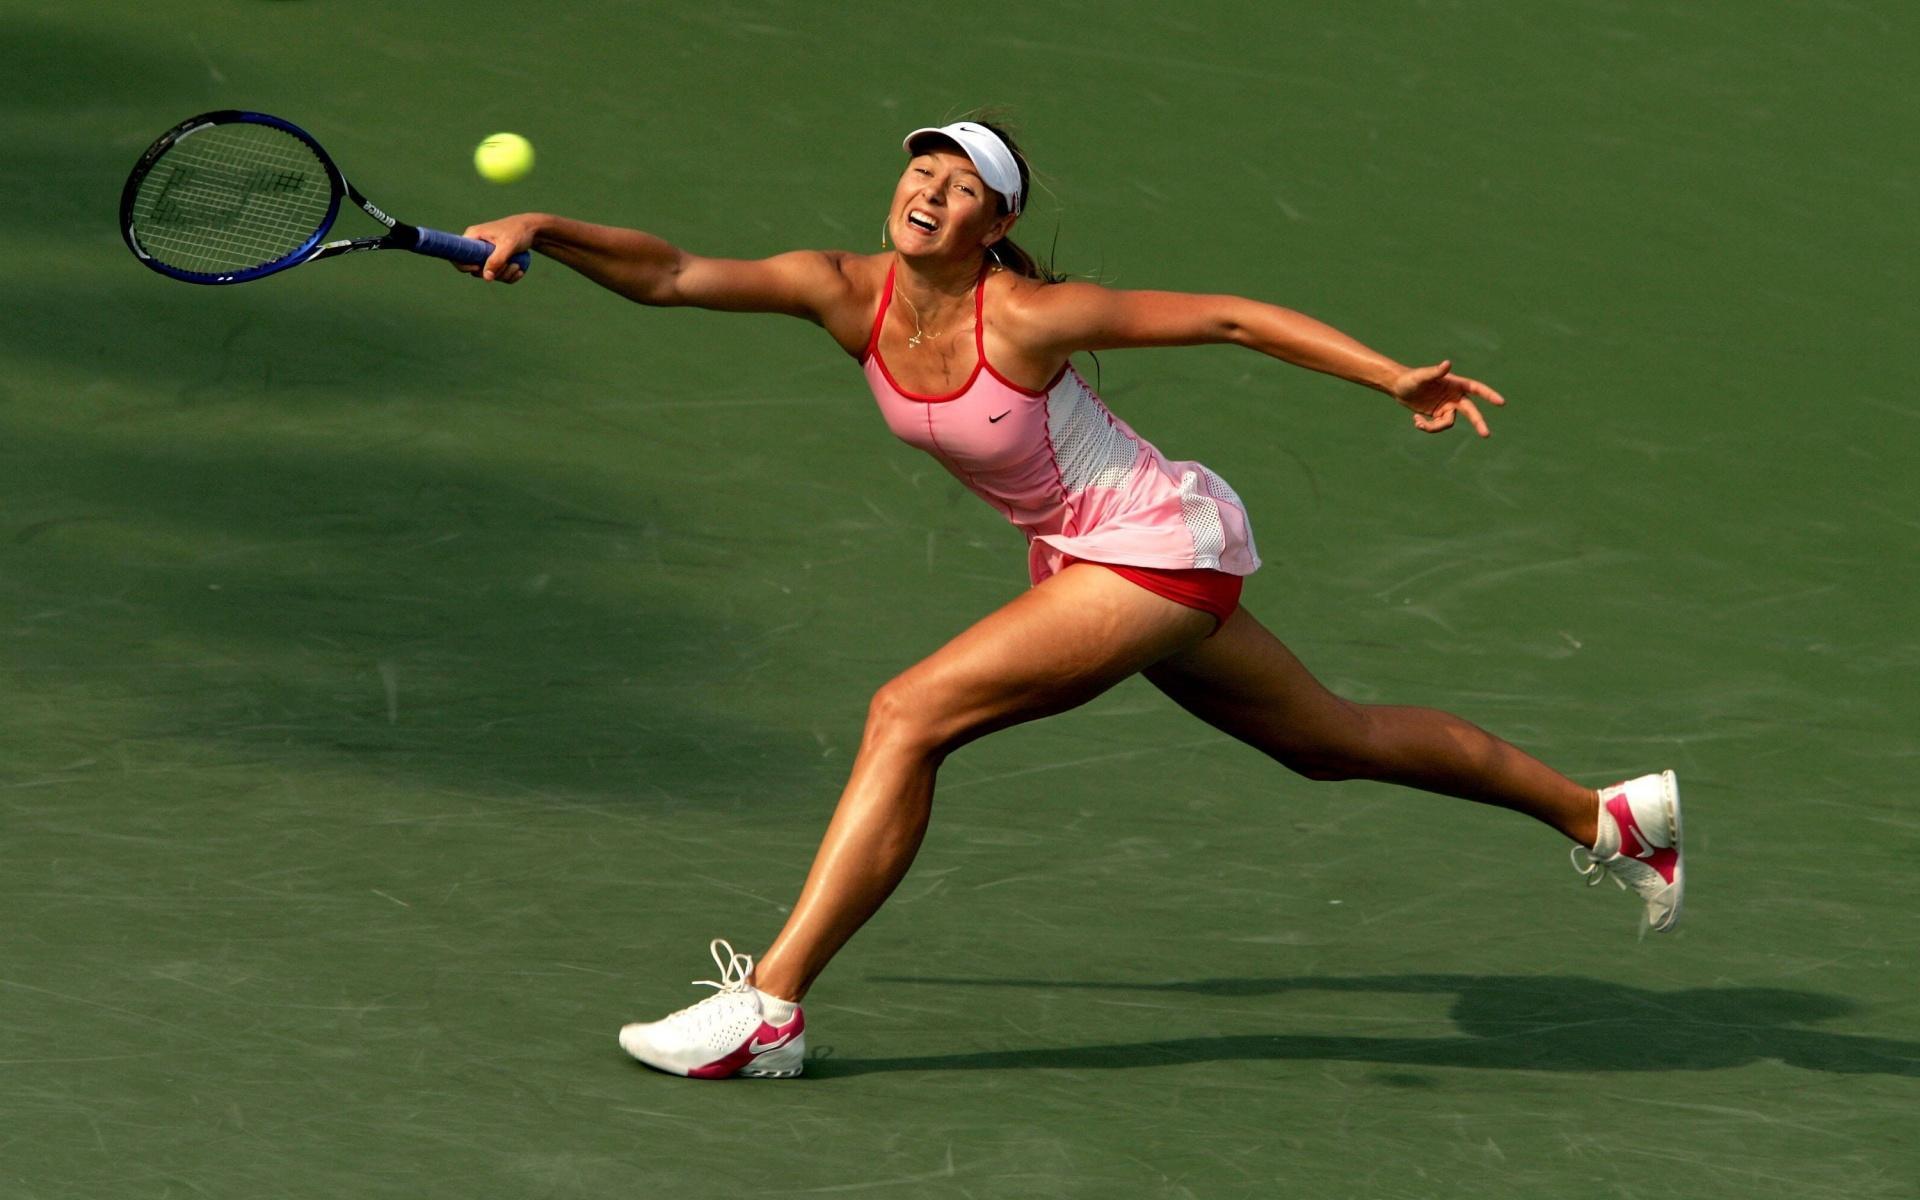 Sport Wallpaper Tennis: Мария Шарапова обои для рабочего стола, картинки, фото